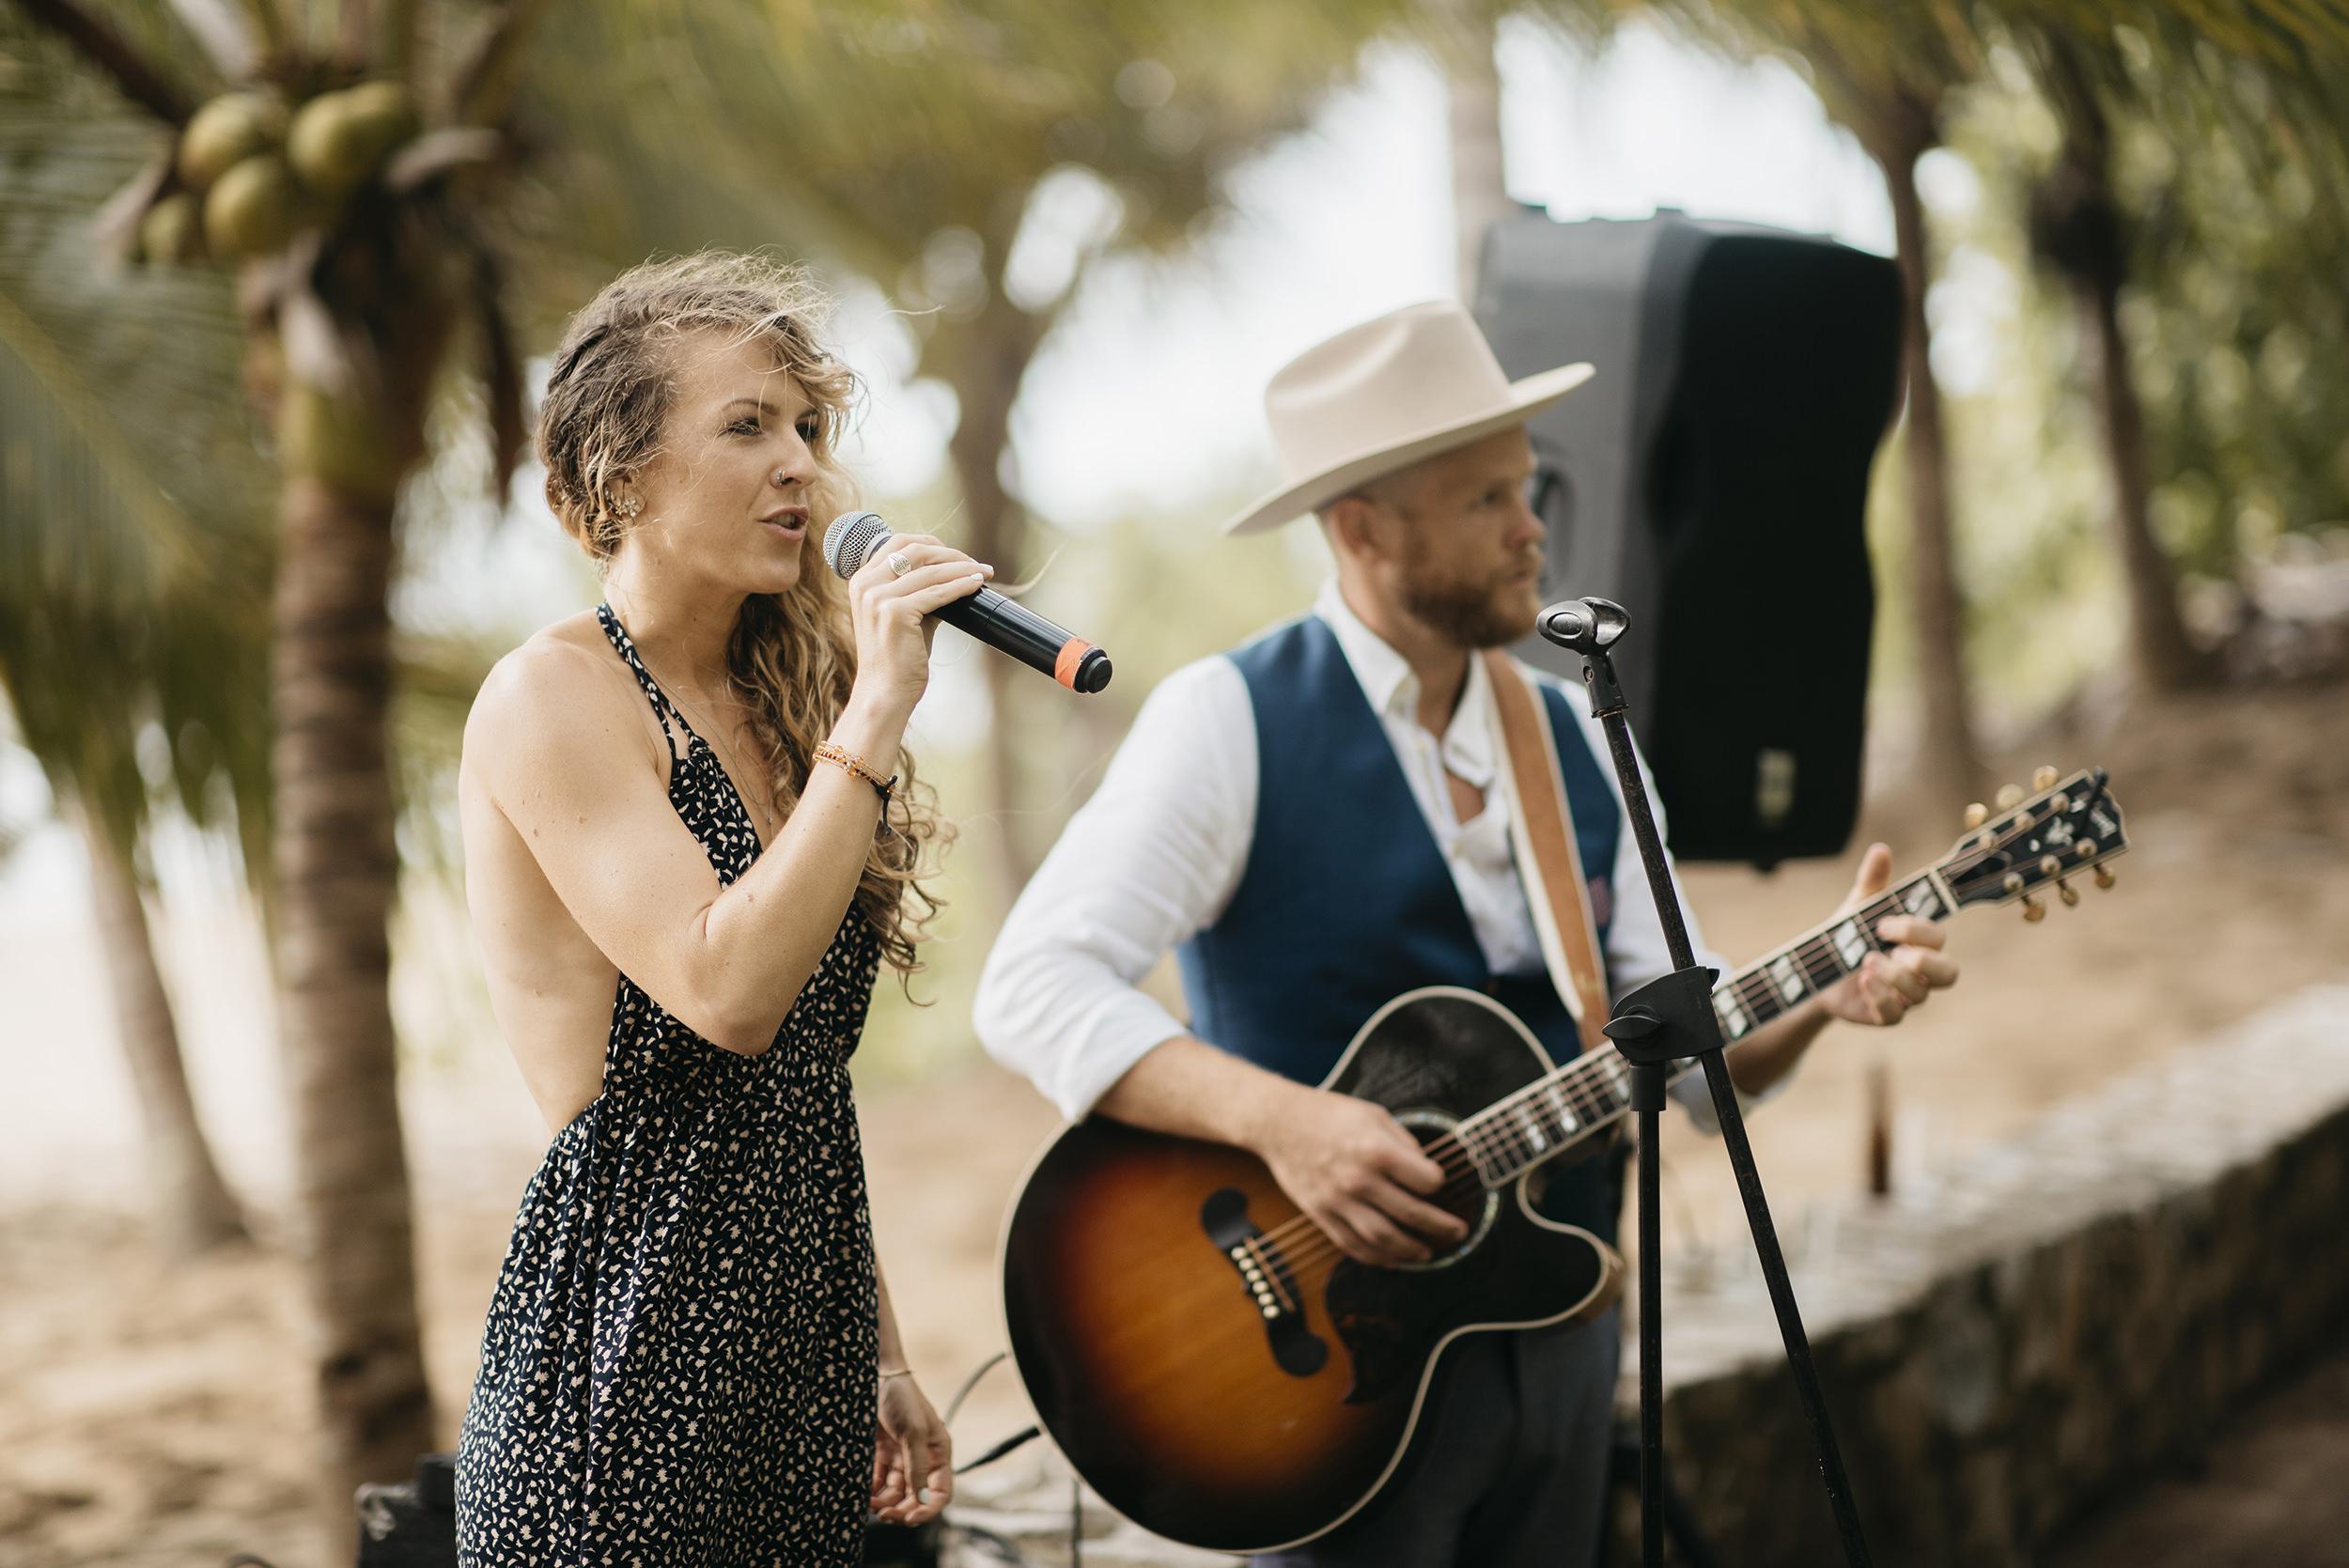 Colby-and-Jess-Intimate-Destination-Wedding-Sayulita-Puerto-Vallarta-Mexico252.jpg